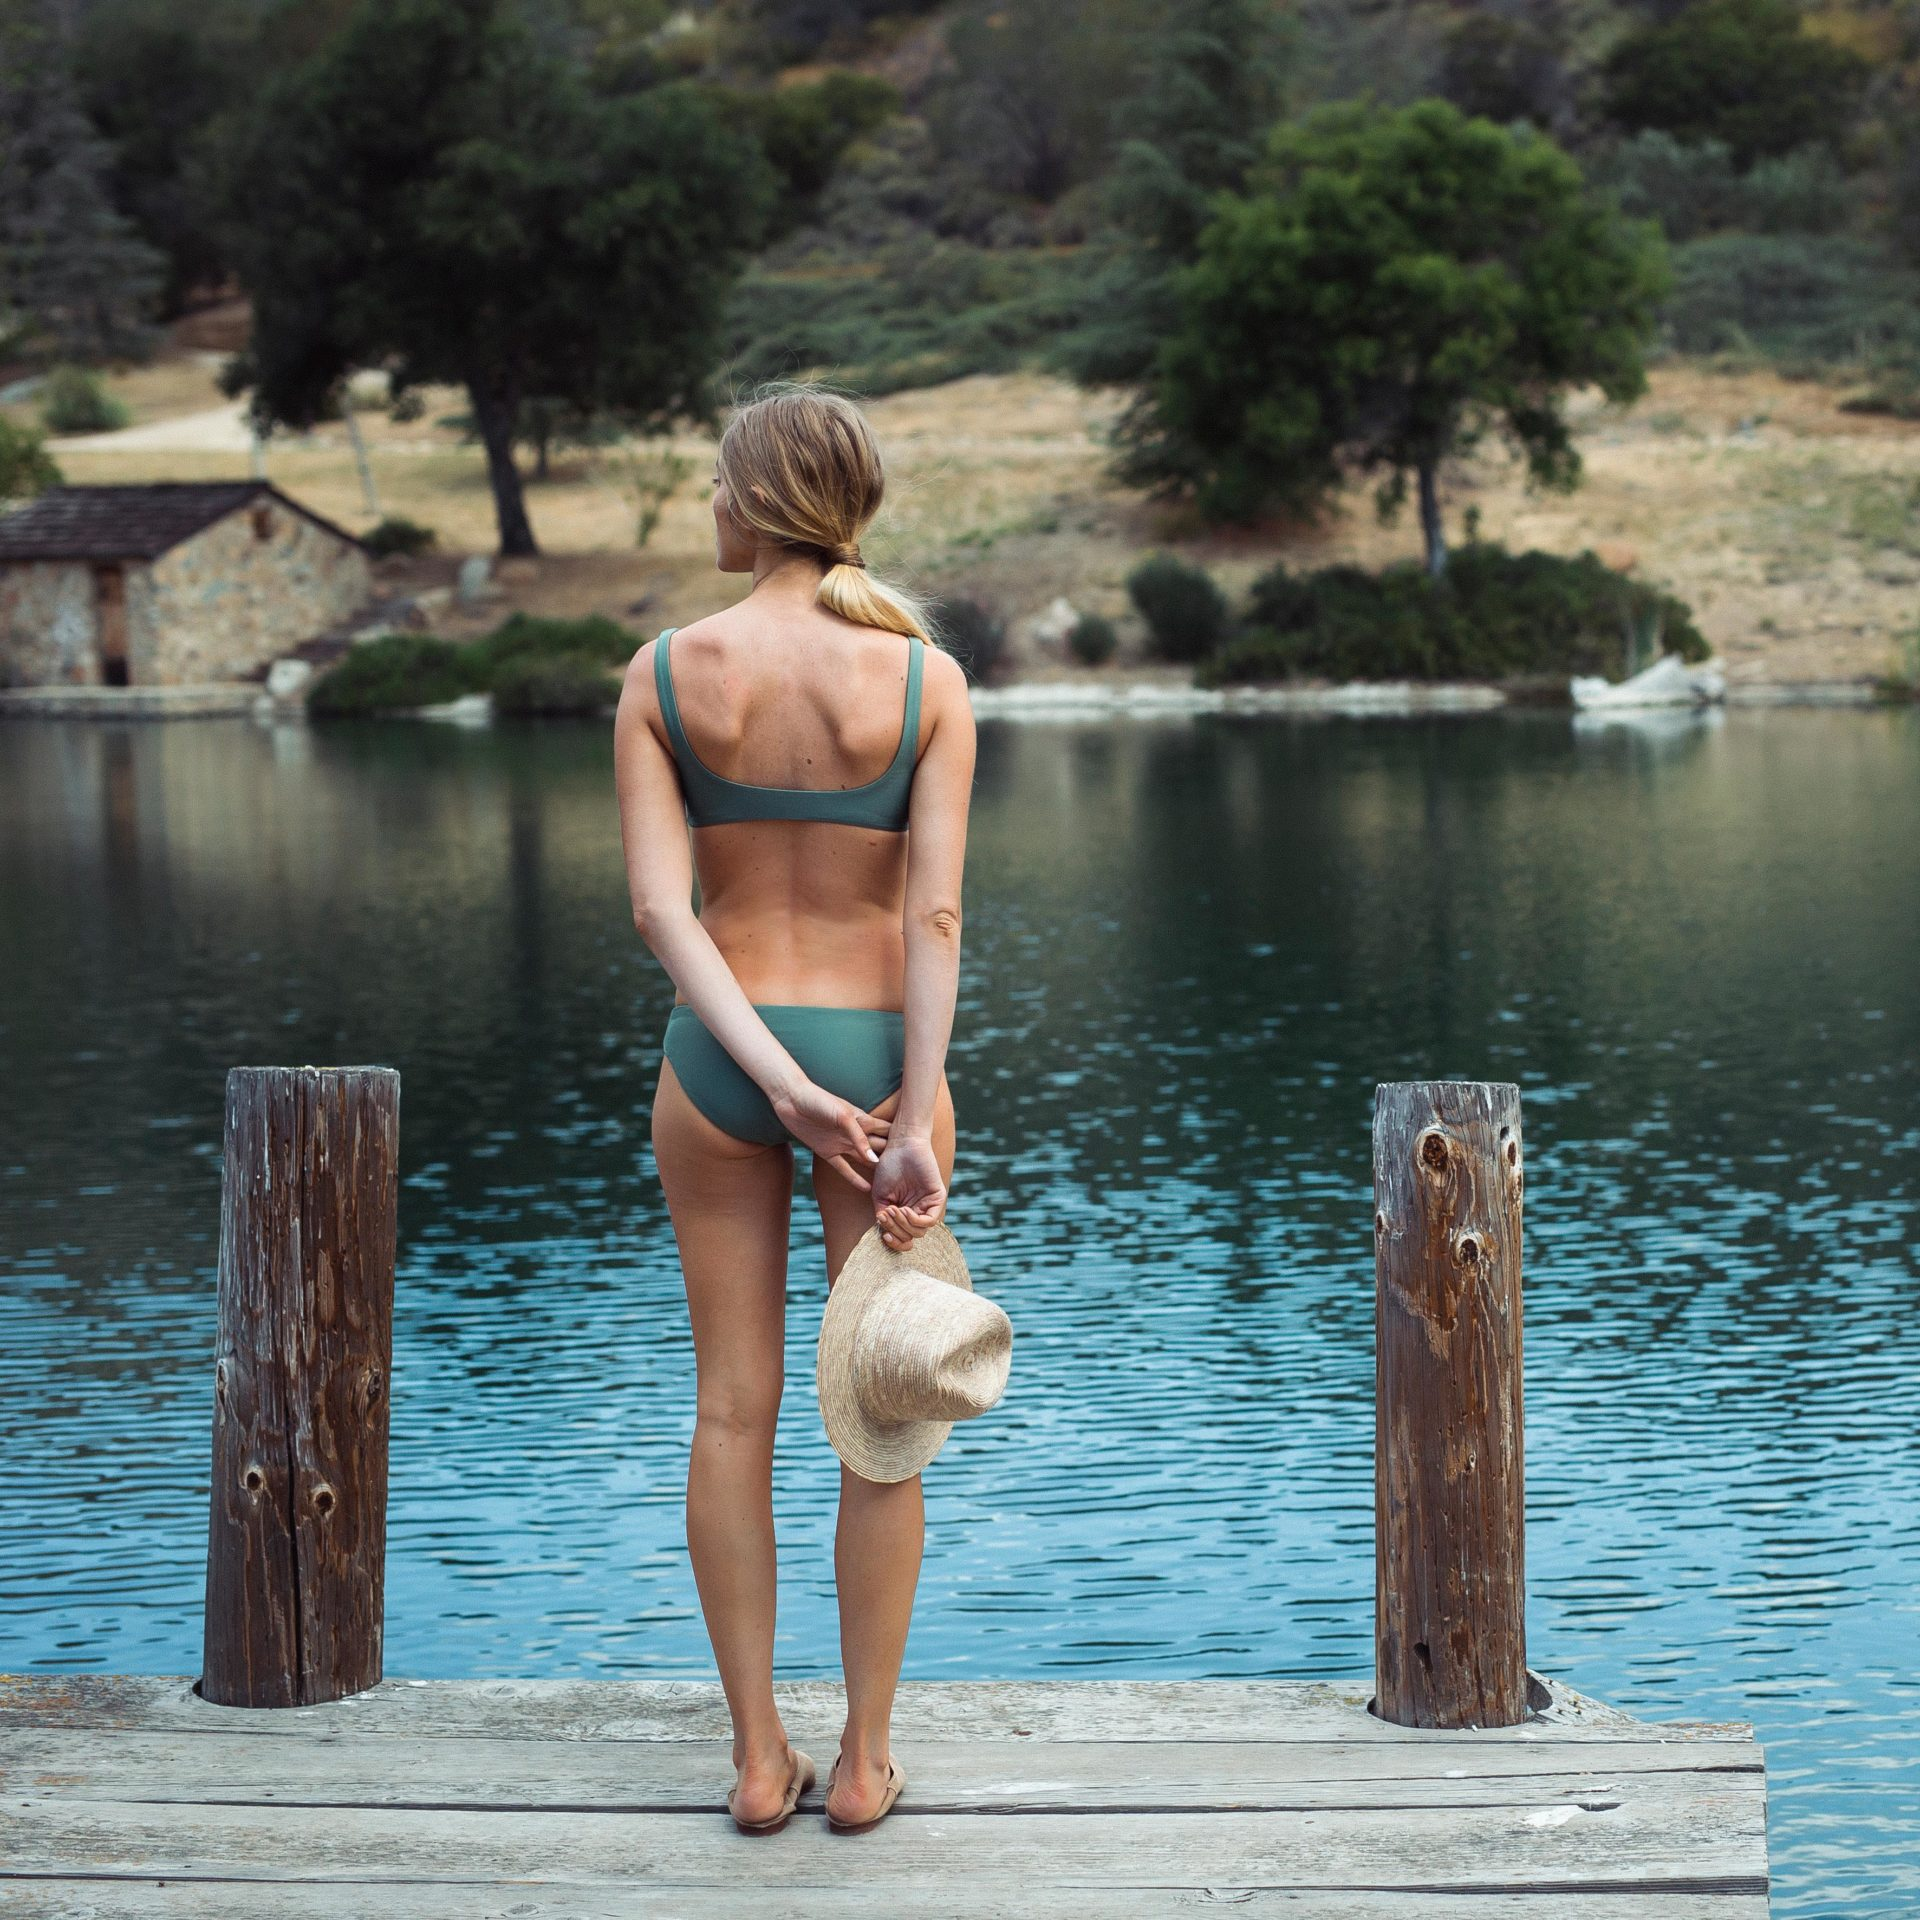 Girl near lake in bikini